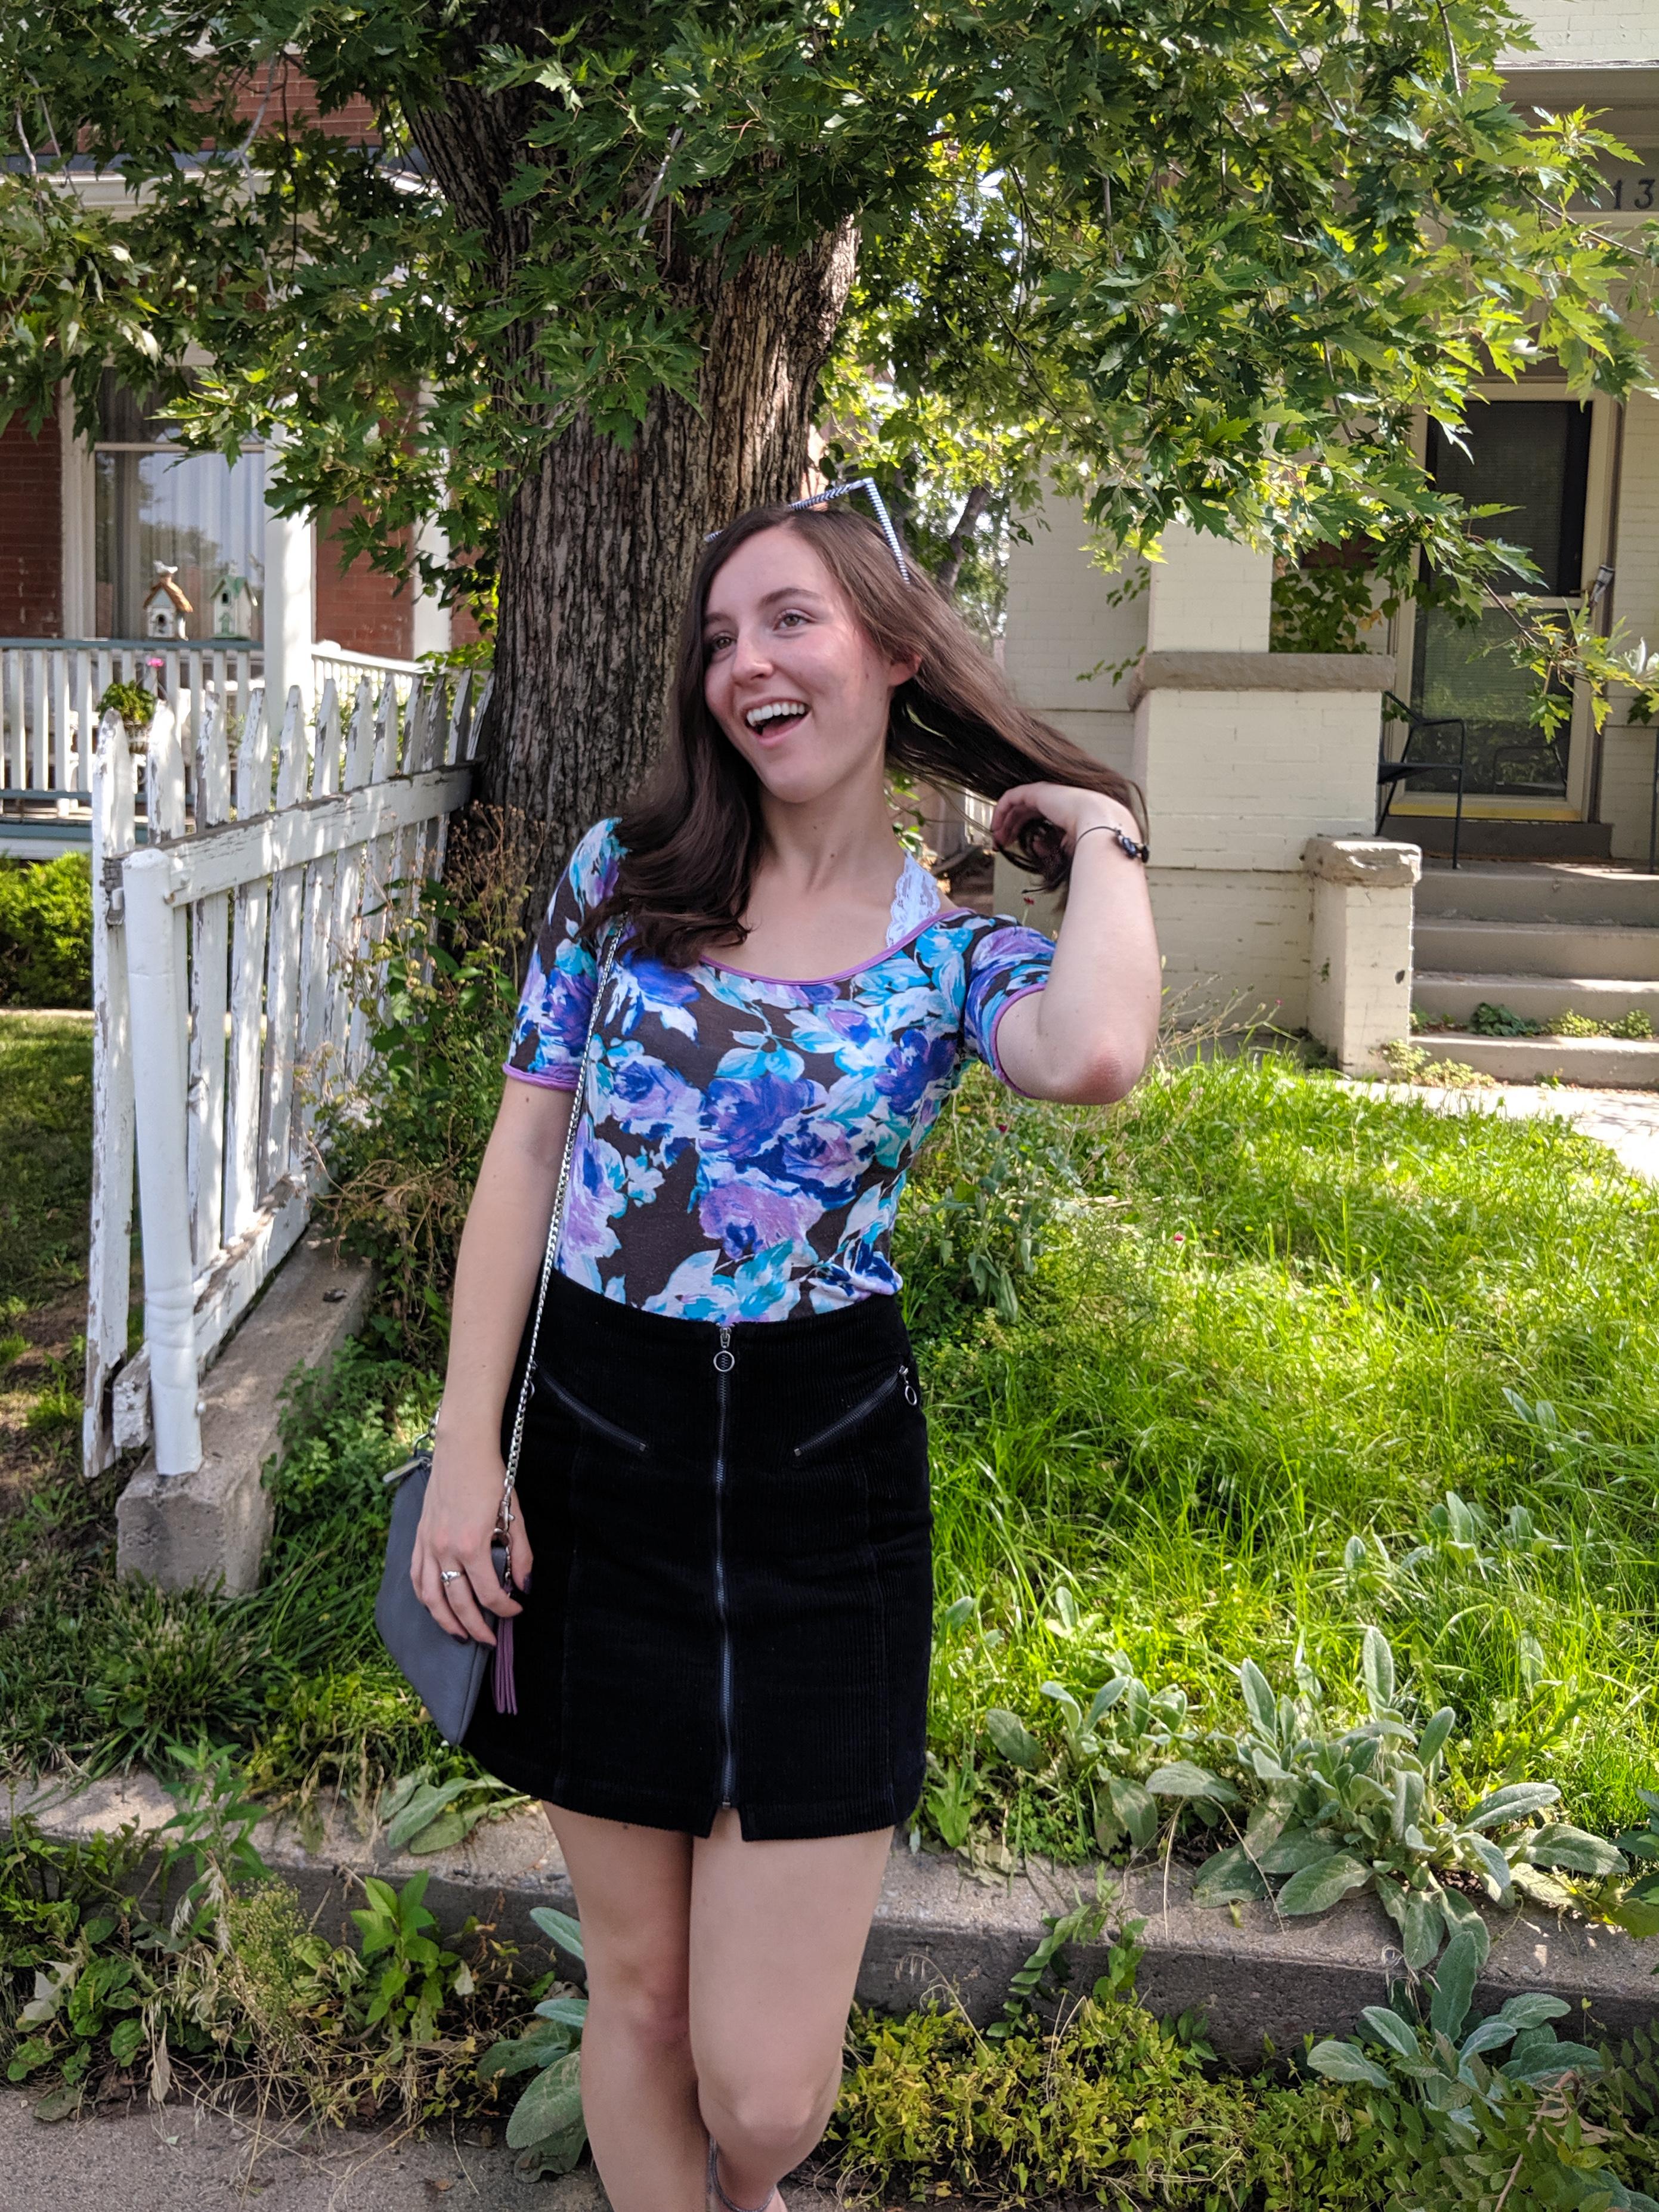 college student, midterm exams, Denver fashion blogger